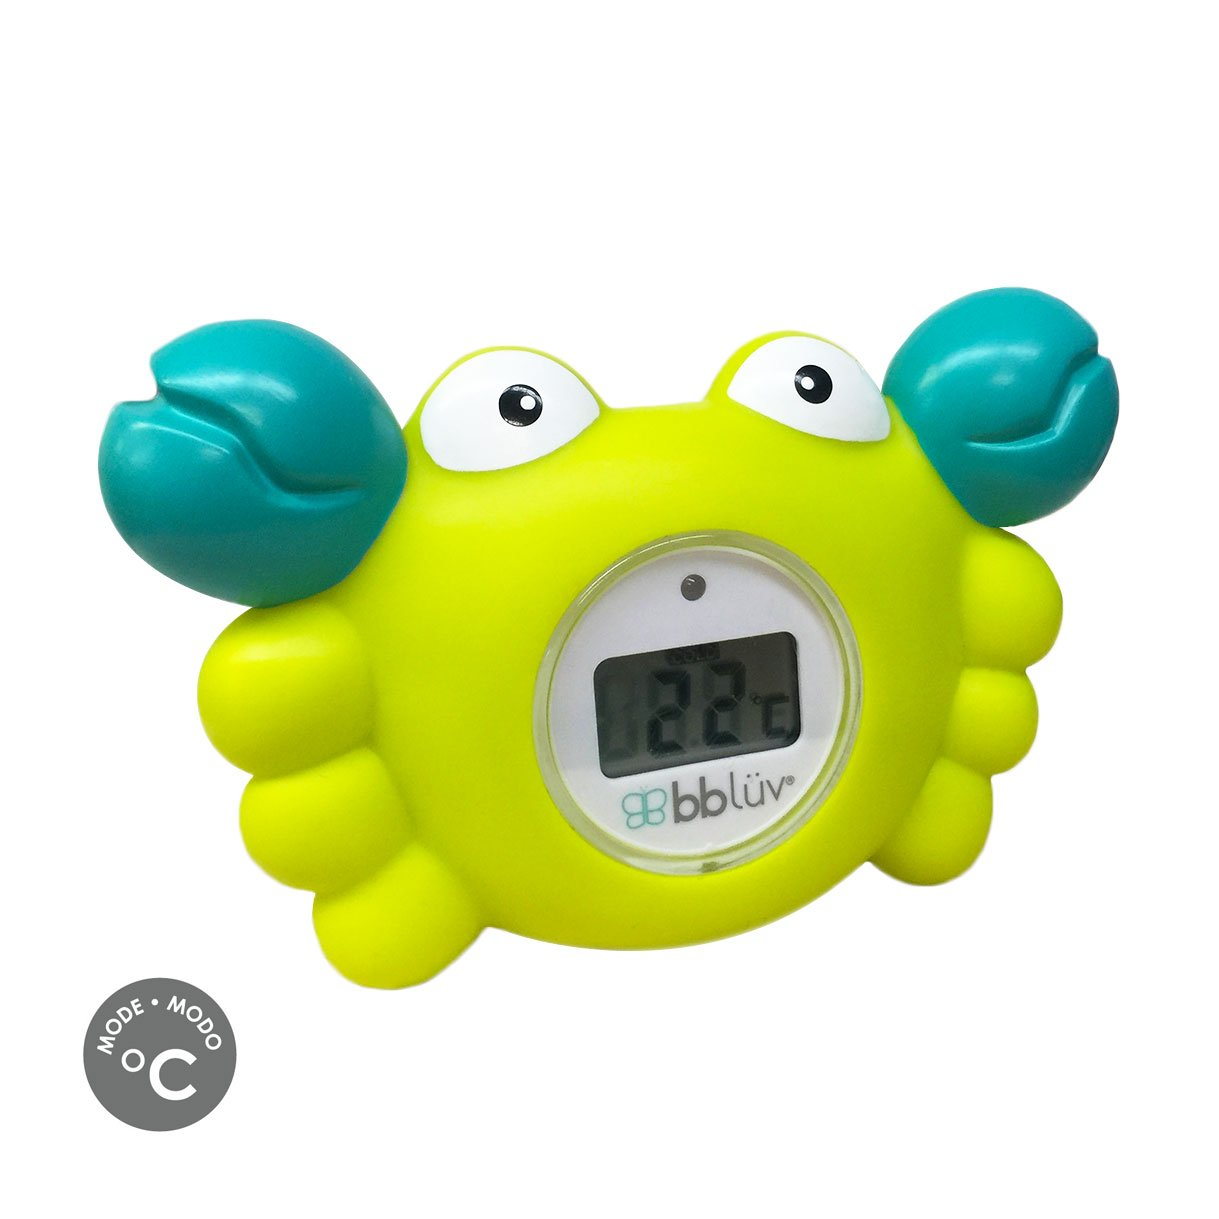 bblüv – Kräb - 3-in-1 Bath Thermometer & Bath Toy (Celsius Mode) B0146-C